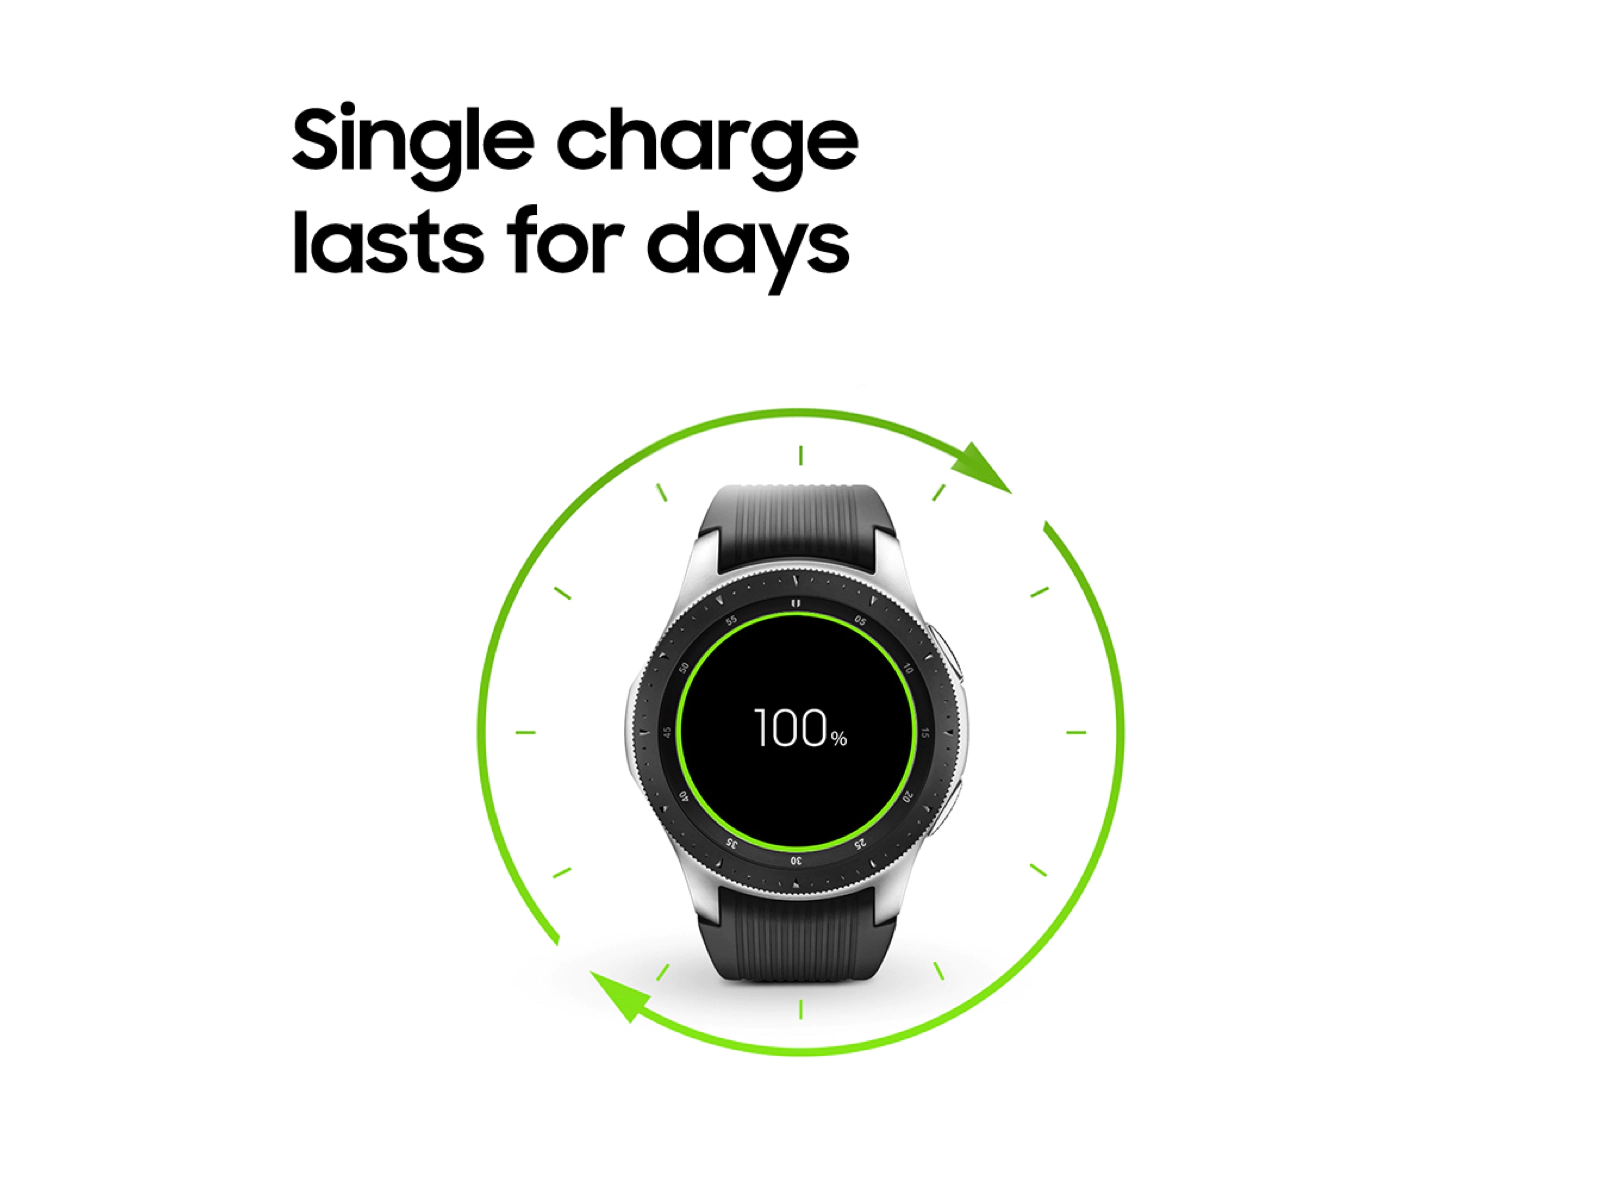 Samsung Galaxy Watch Battery Life